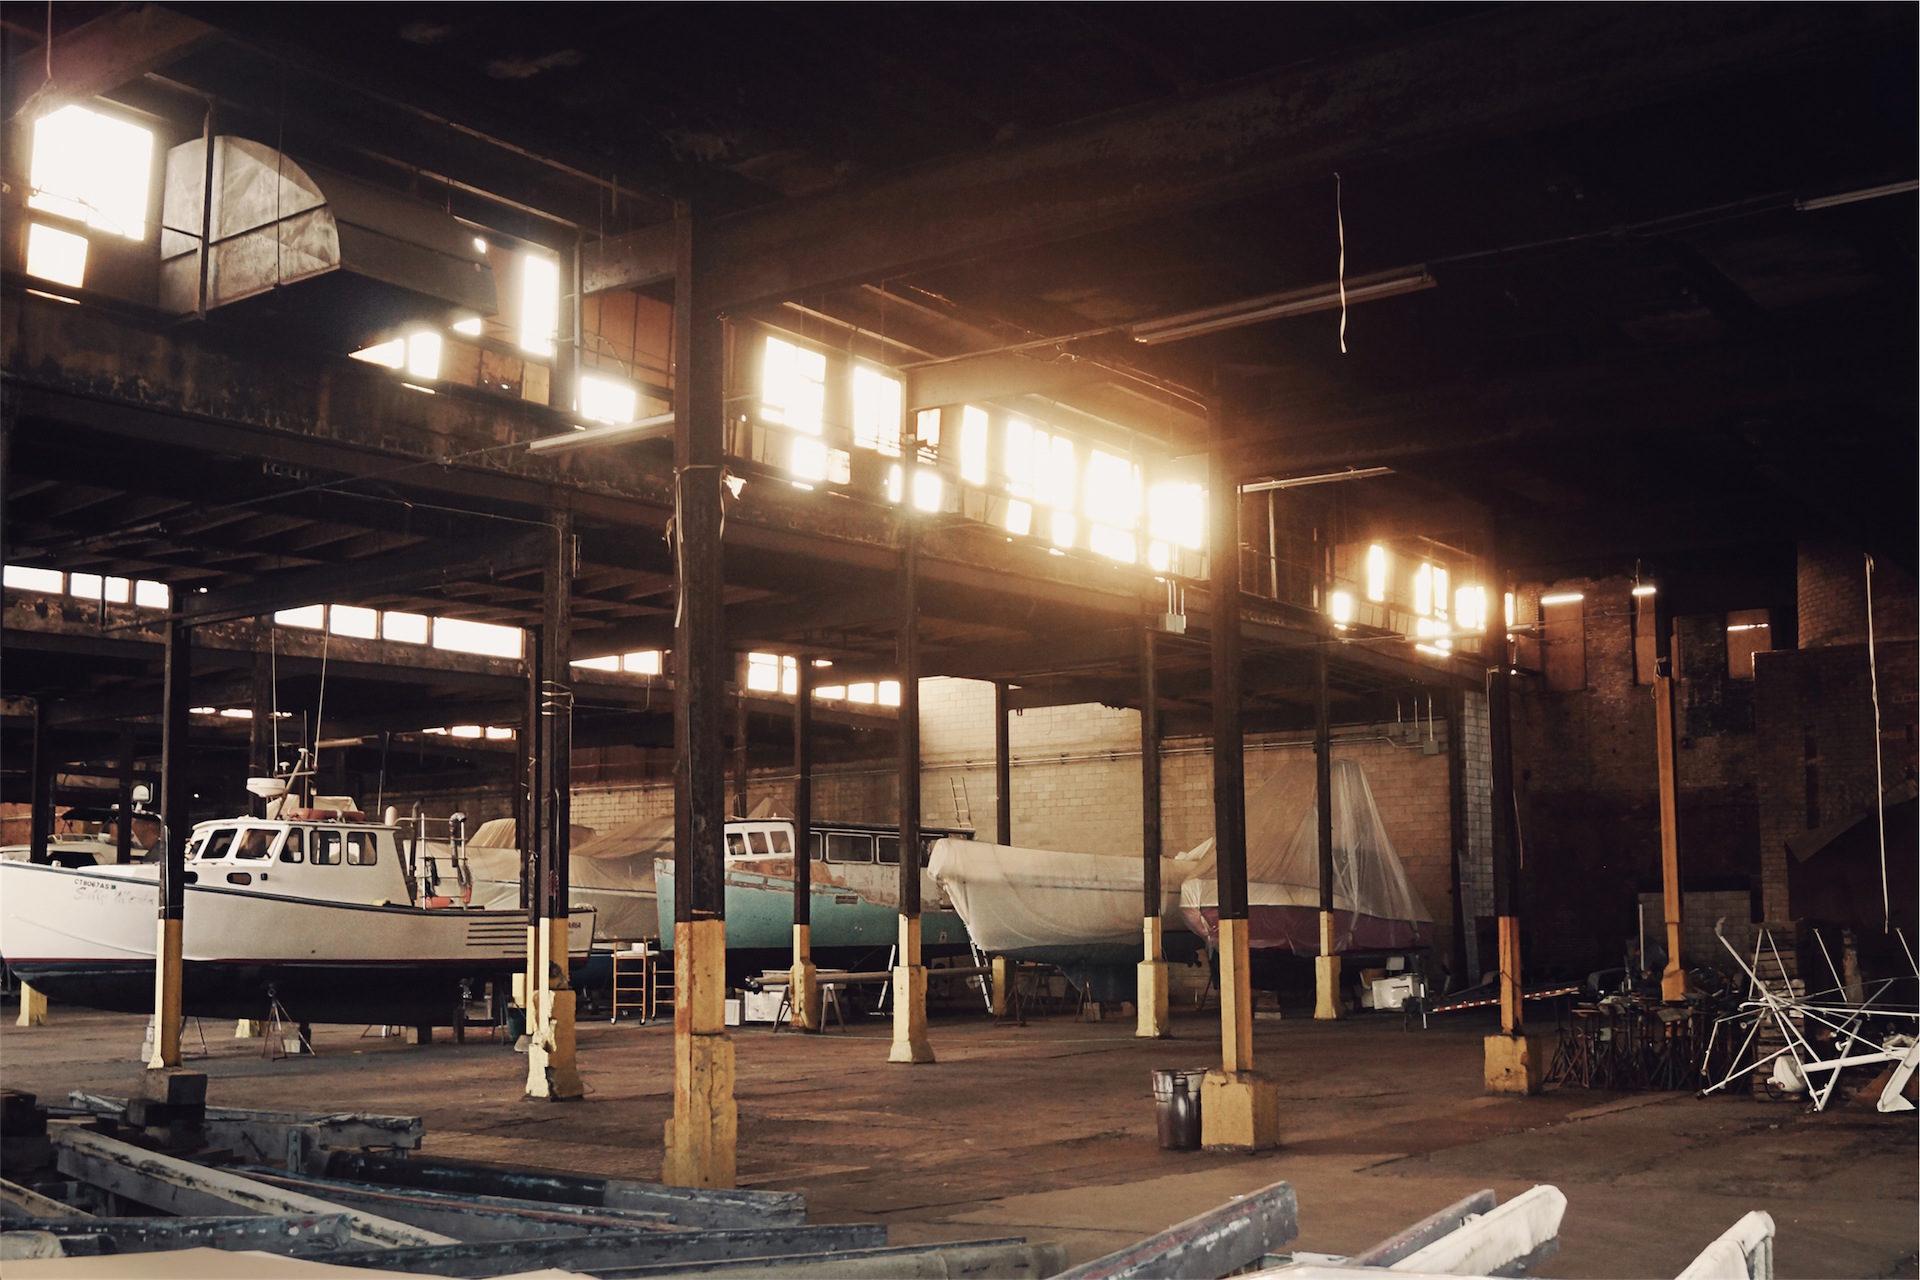 barcos, muelle, puerto, ventanas, luces - Fondos de Pantalla HD - professor-falken.com